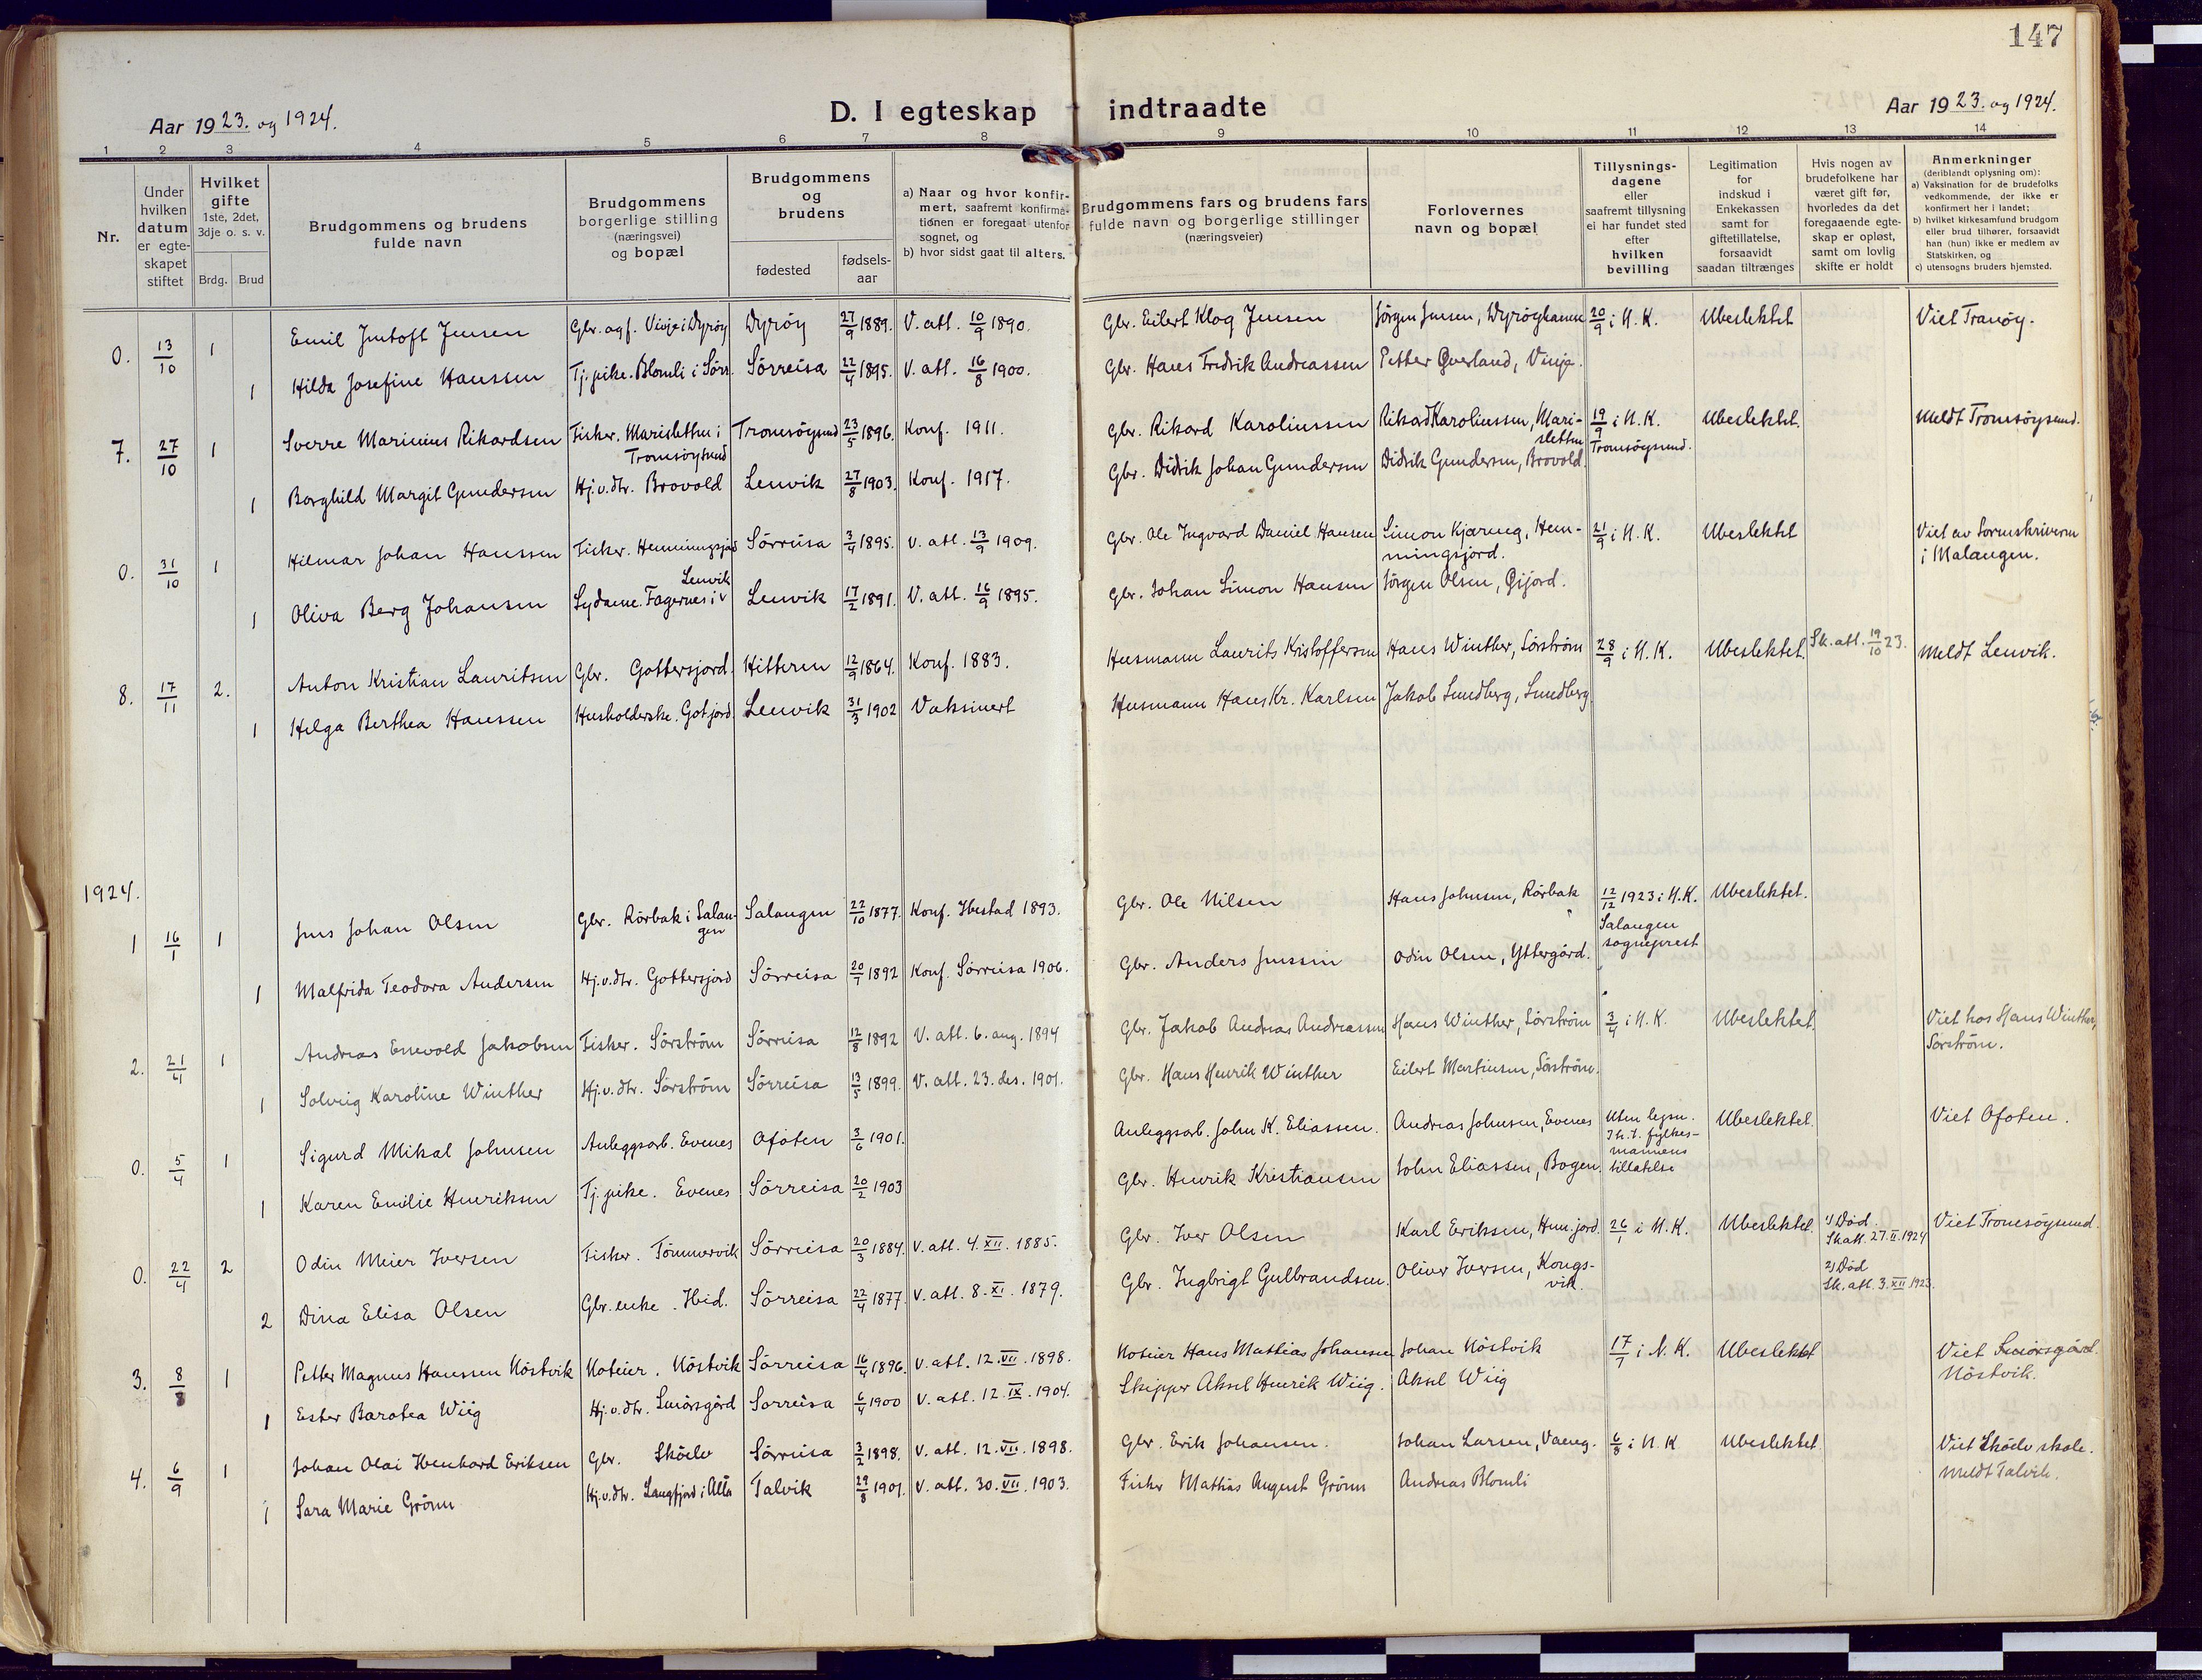 SATØ, Tranøy sokneprestkontor, I/Ia/Iaa/L0015kirke: Ministerialbok nr. 15, 1919-1928, s. 147